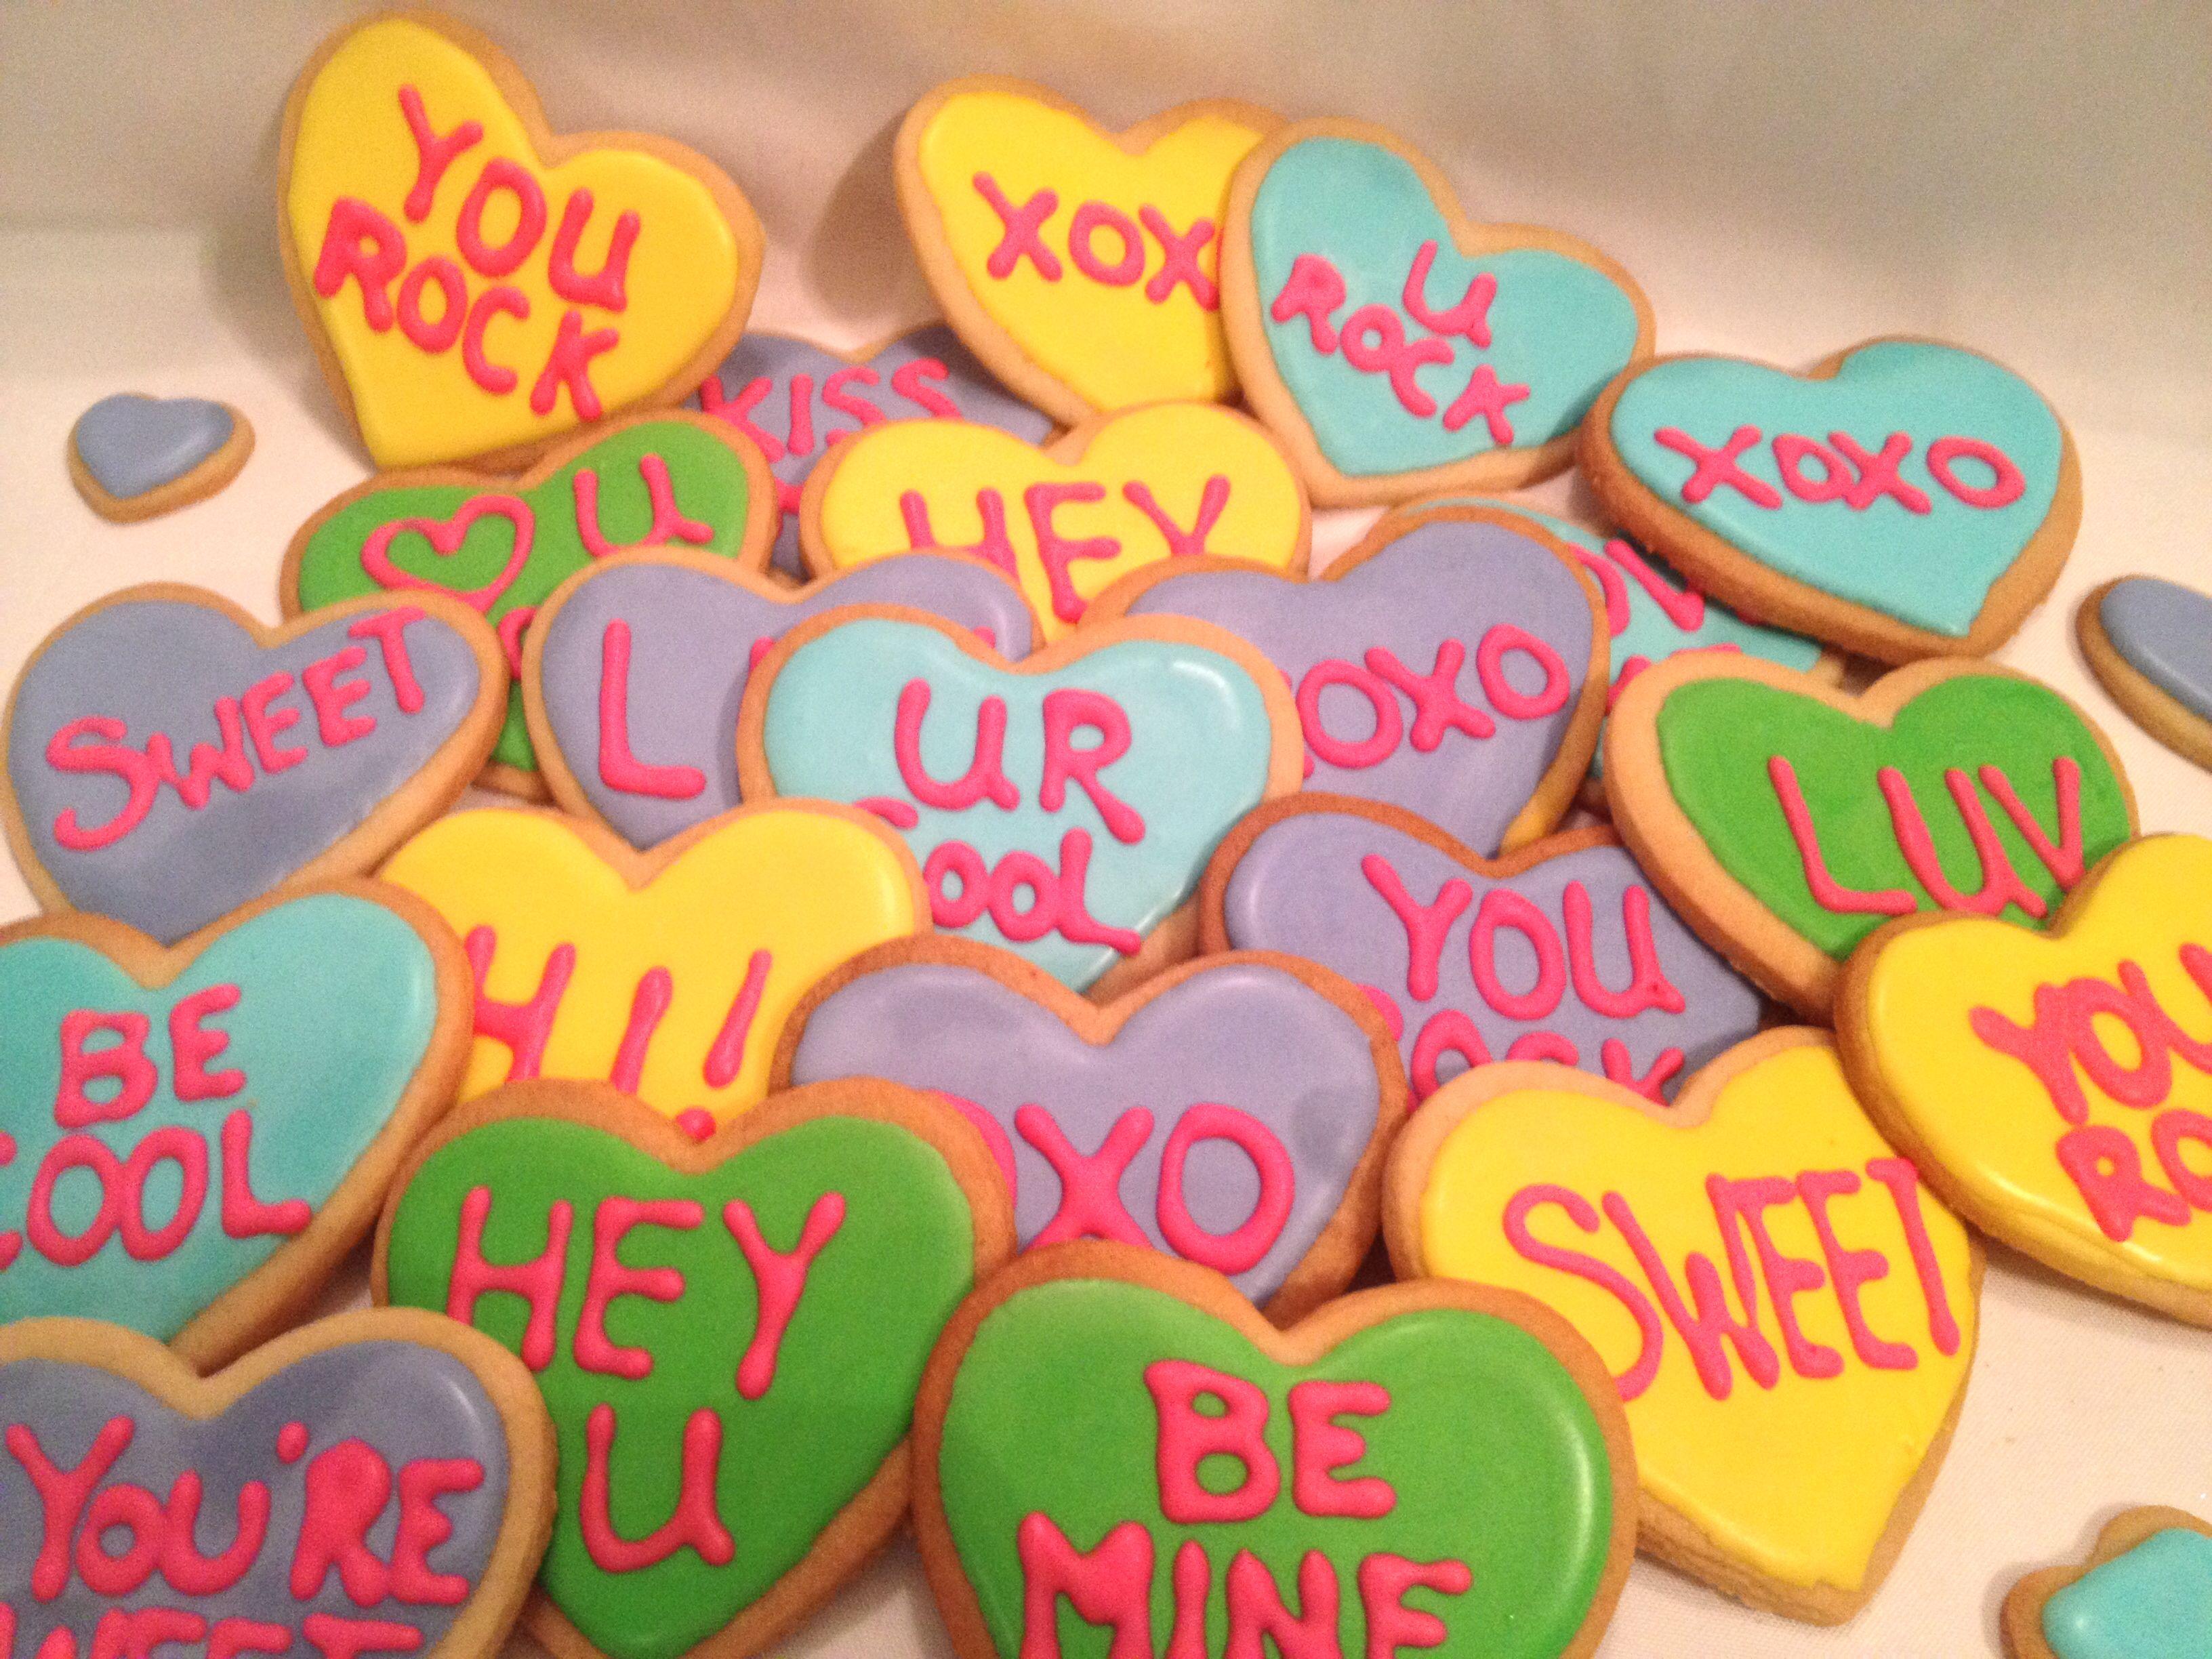 Valentine sweet treats Www.facebook.com/brooklynsheavenlycreations and Instagram @btooklynsheavenlycreations